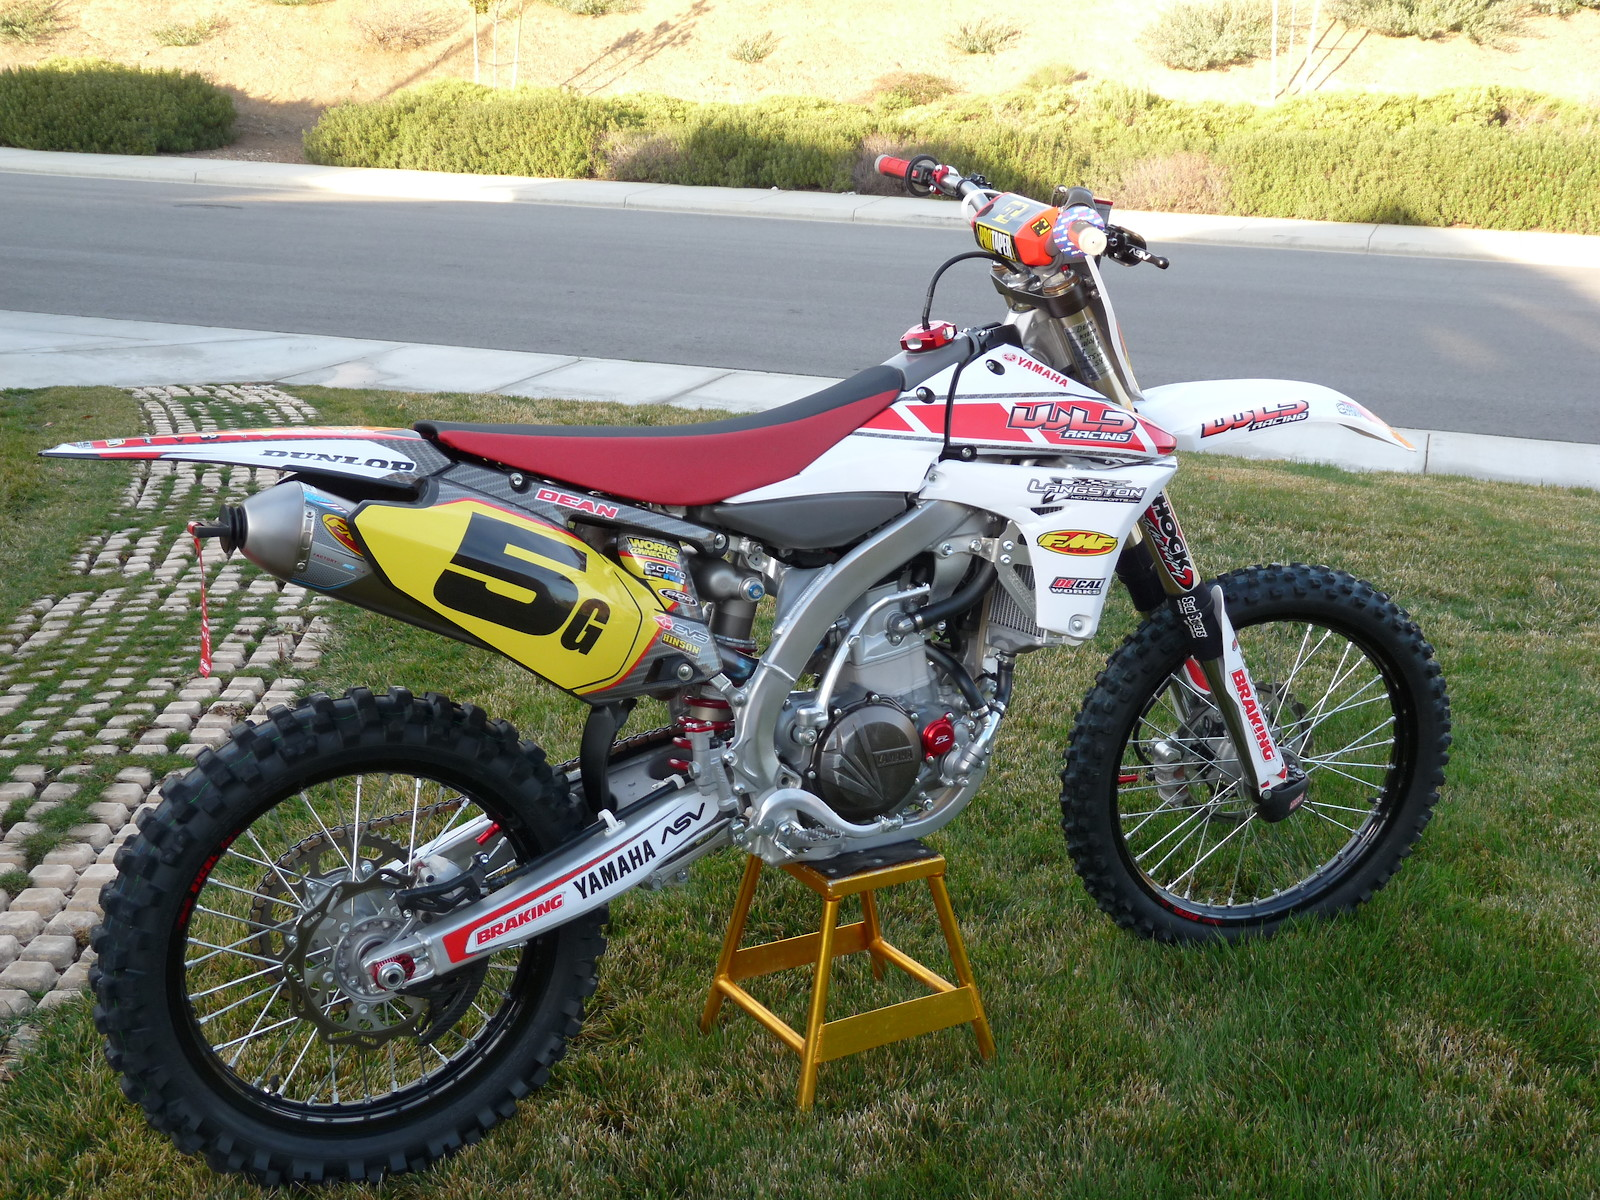 P1230522 - WLD - Motocross Pictures - Vital MX